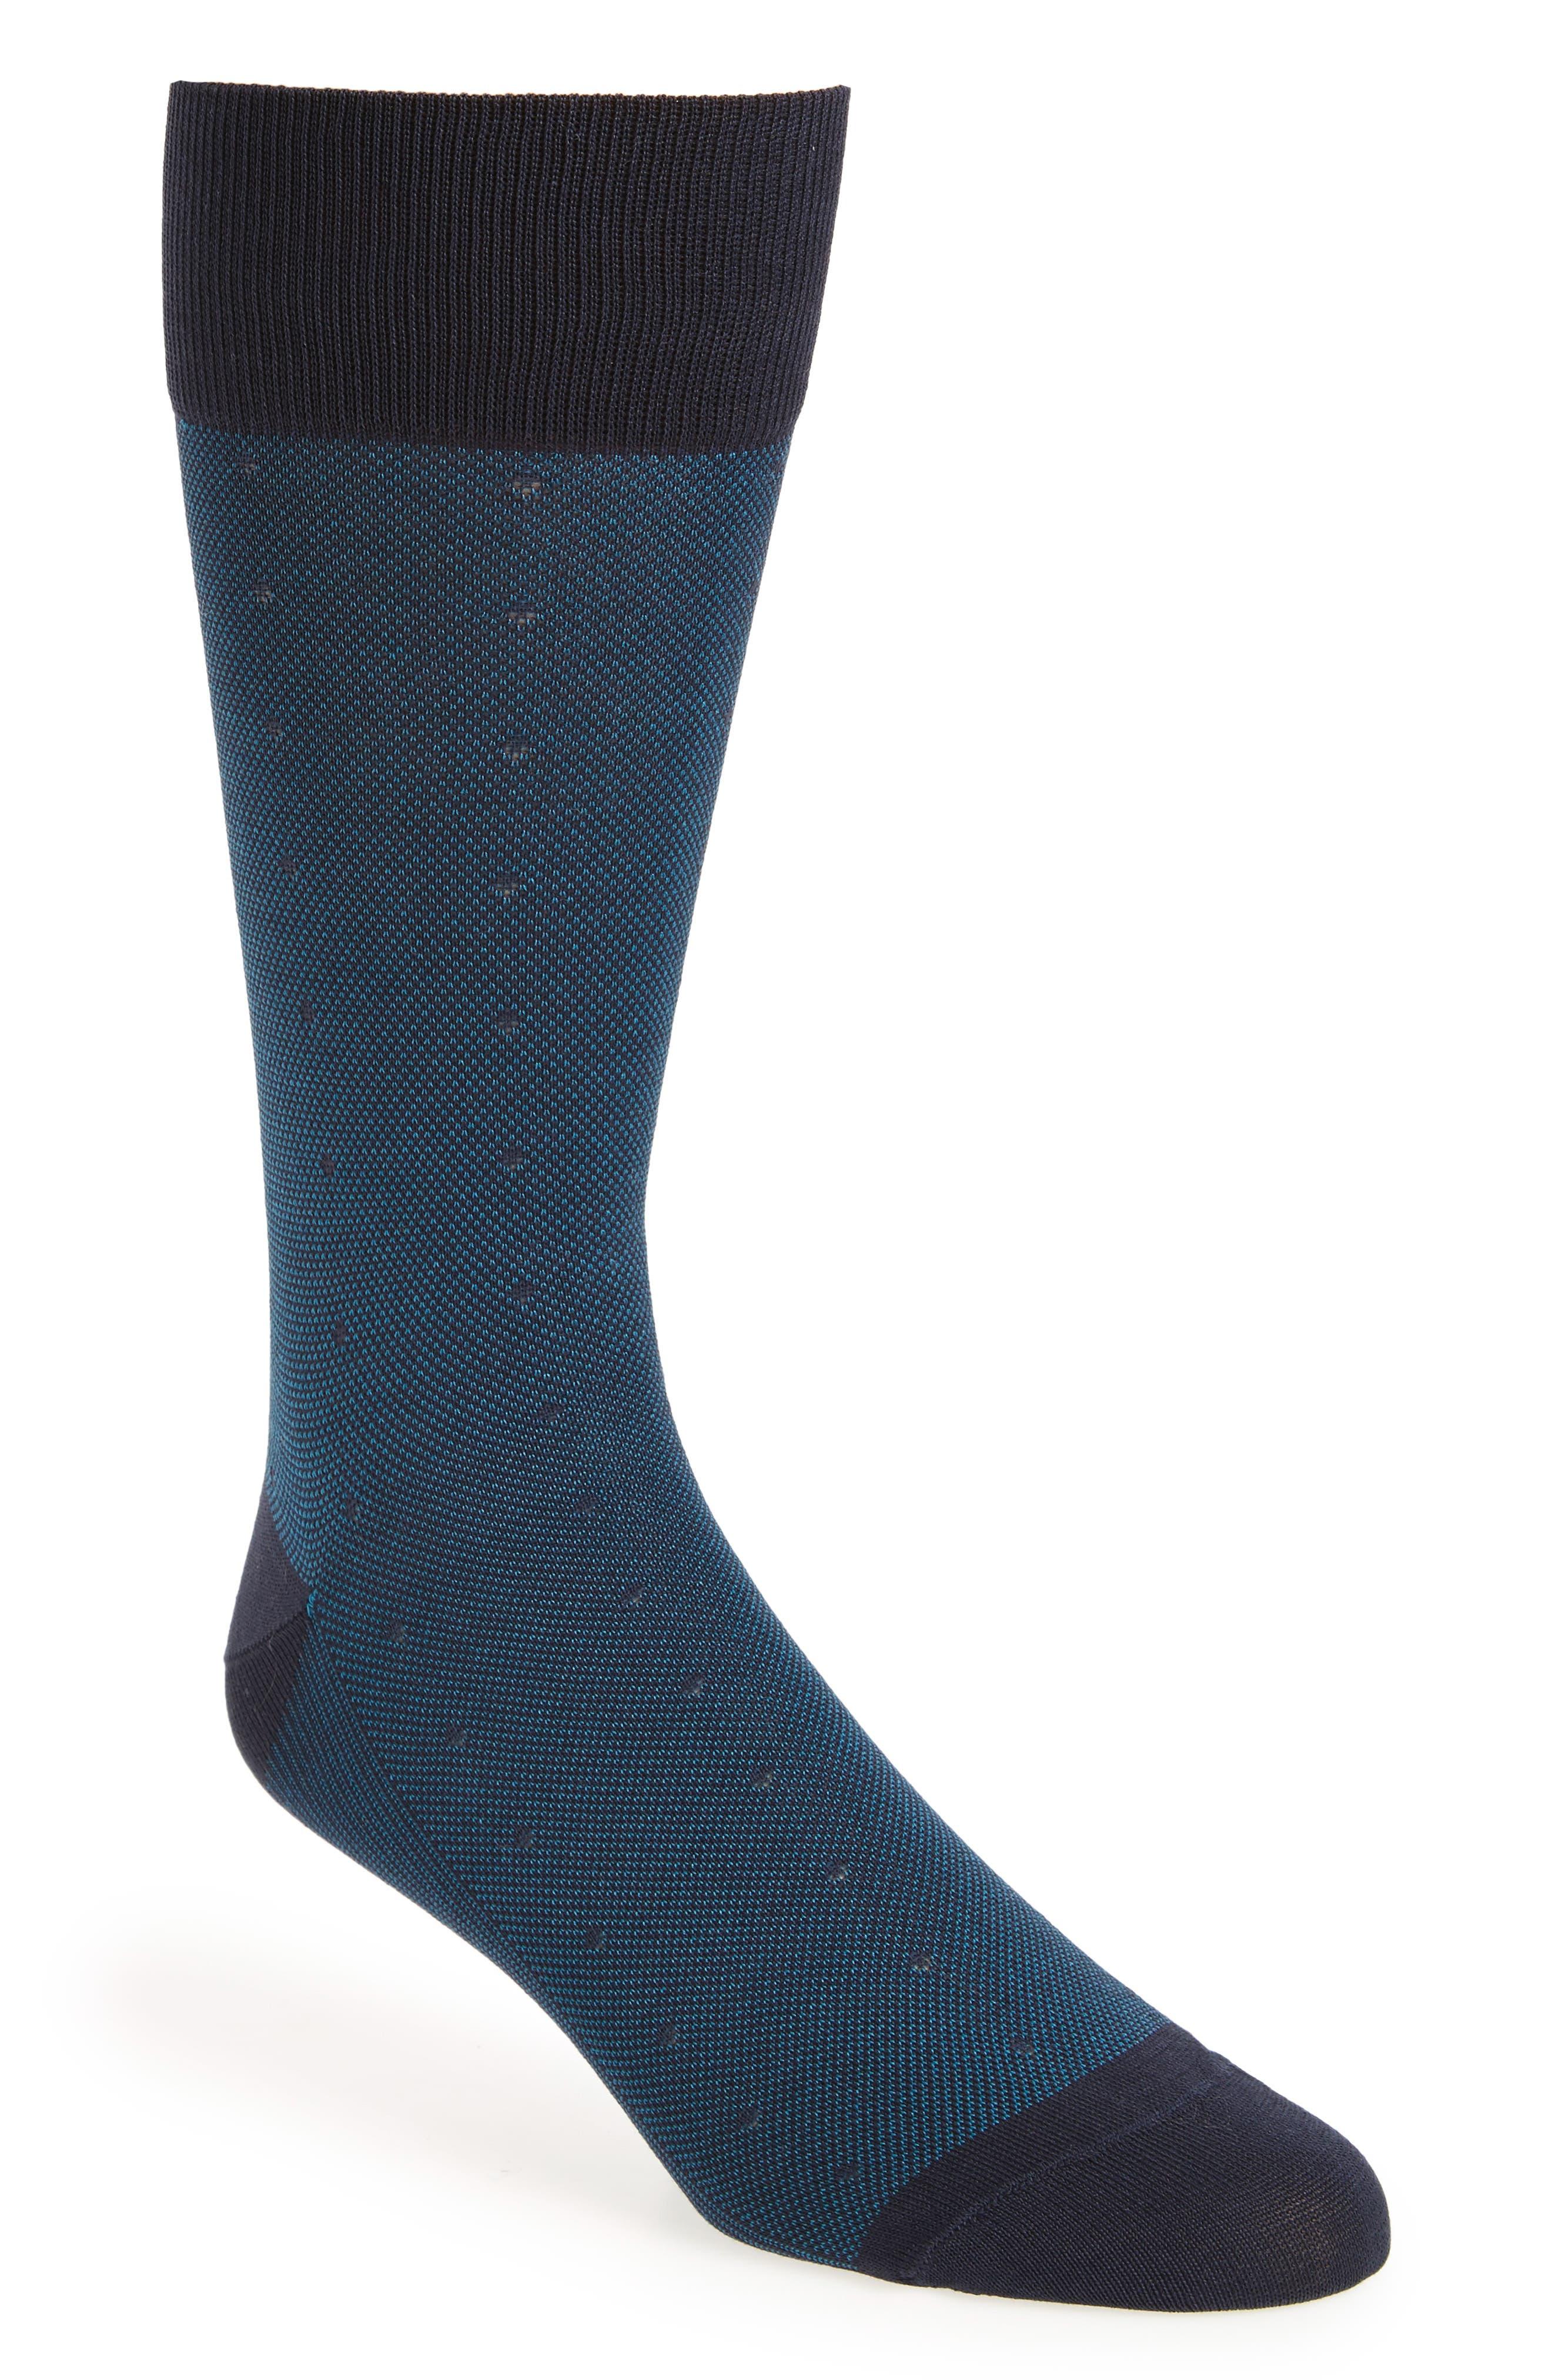 Mercerized Piqué Dot Socks,                             Main thumbnail 1, color,                             Navy/ Blue